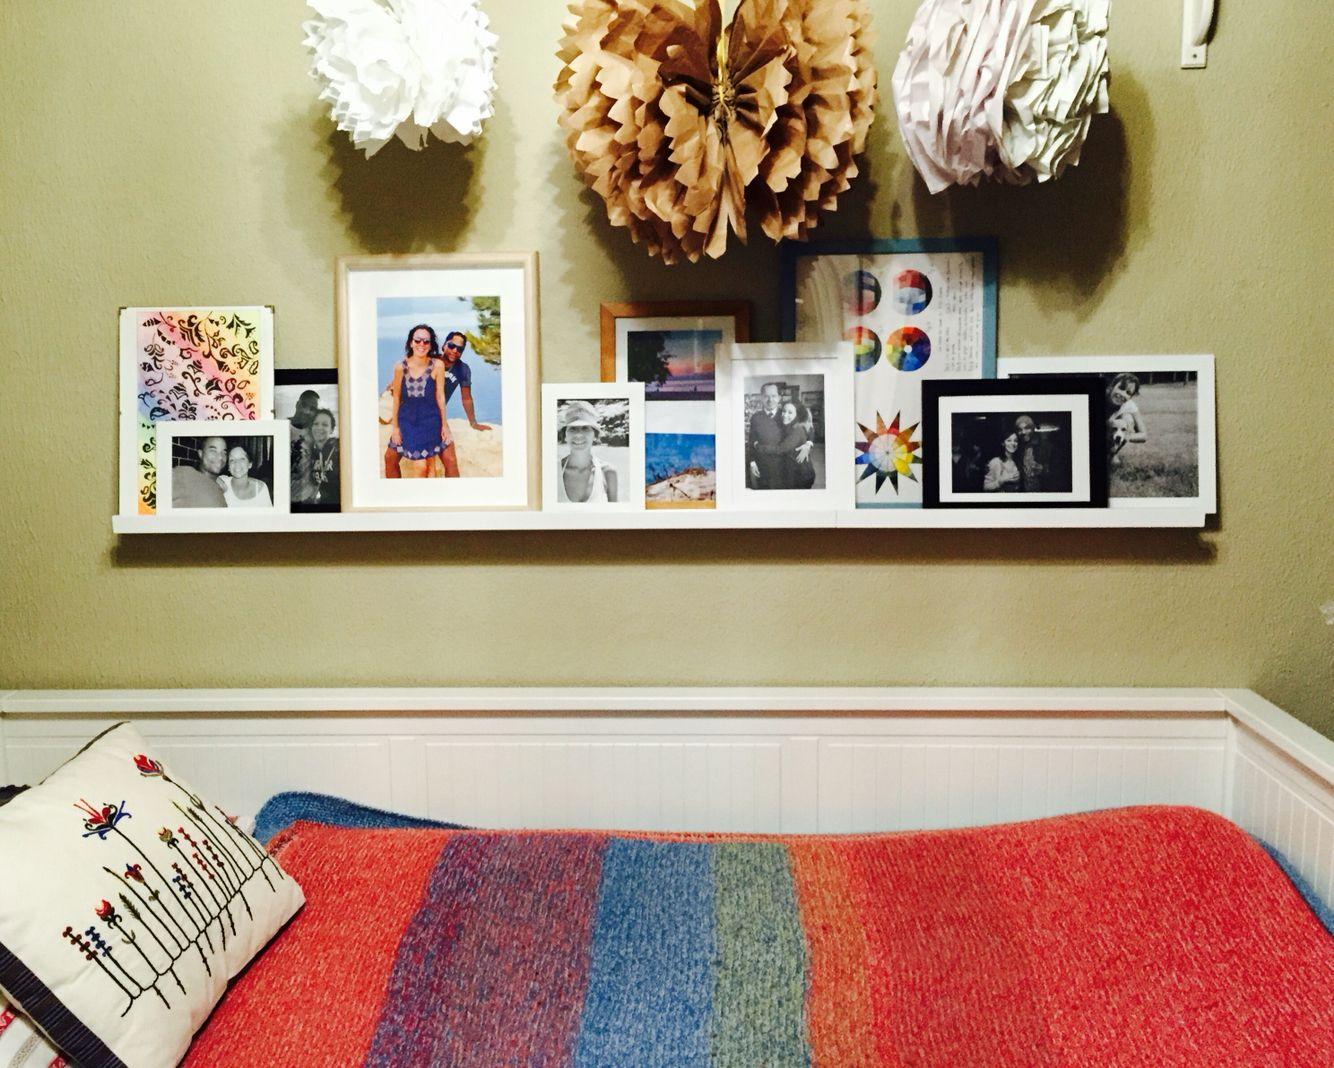 #painting #pictures #memories #photos #bedroom #boho #colors #interior #design #decor